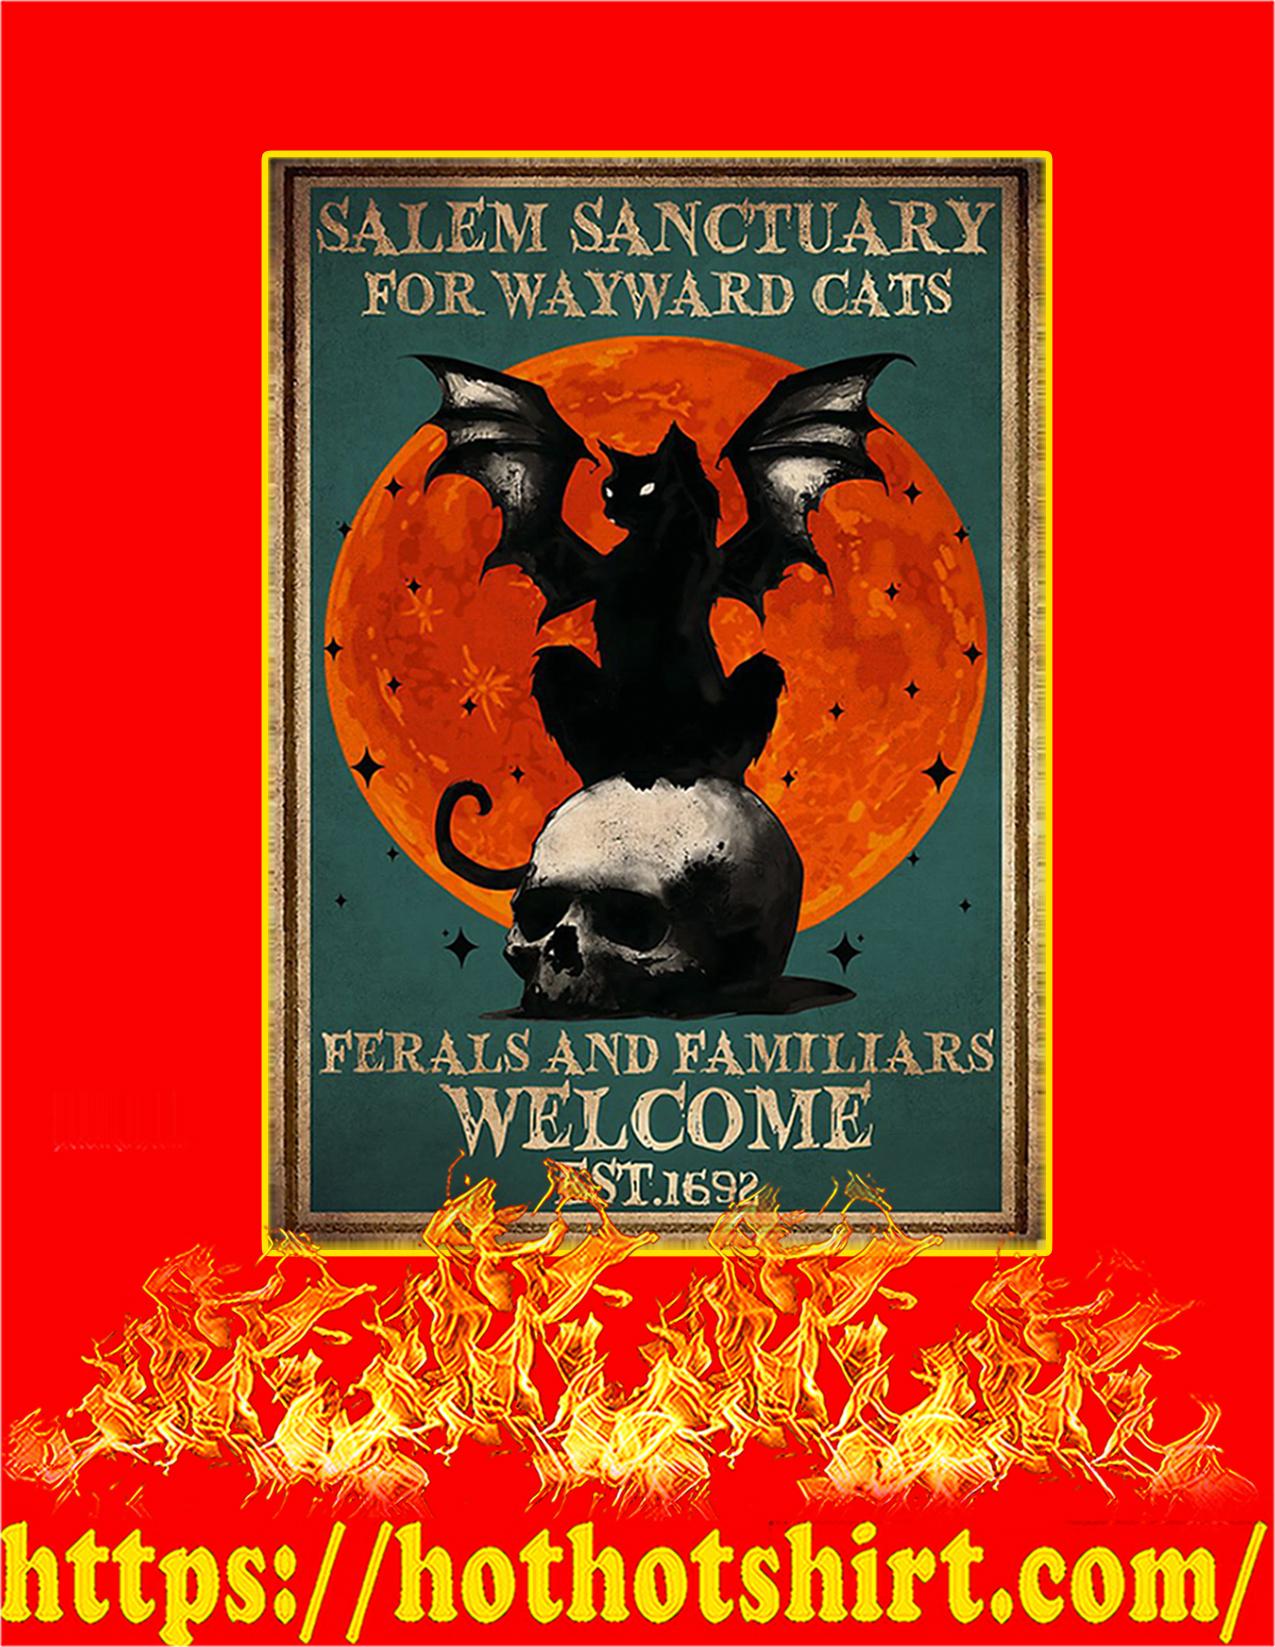 Salem sanctuary for wayward cats poster - A2